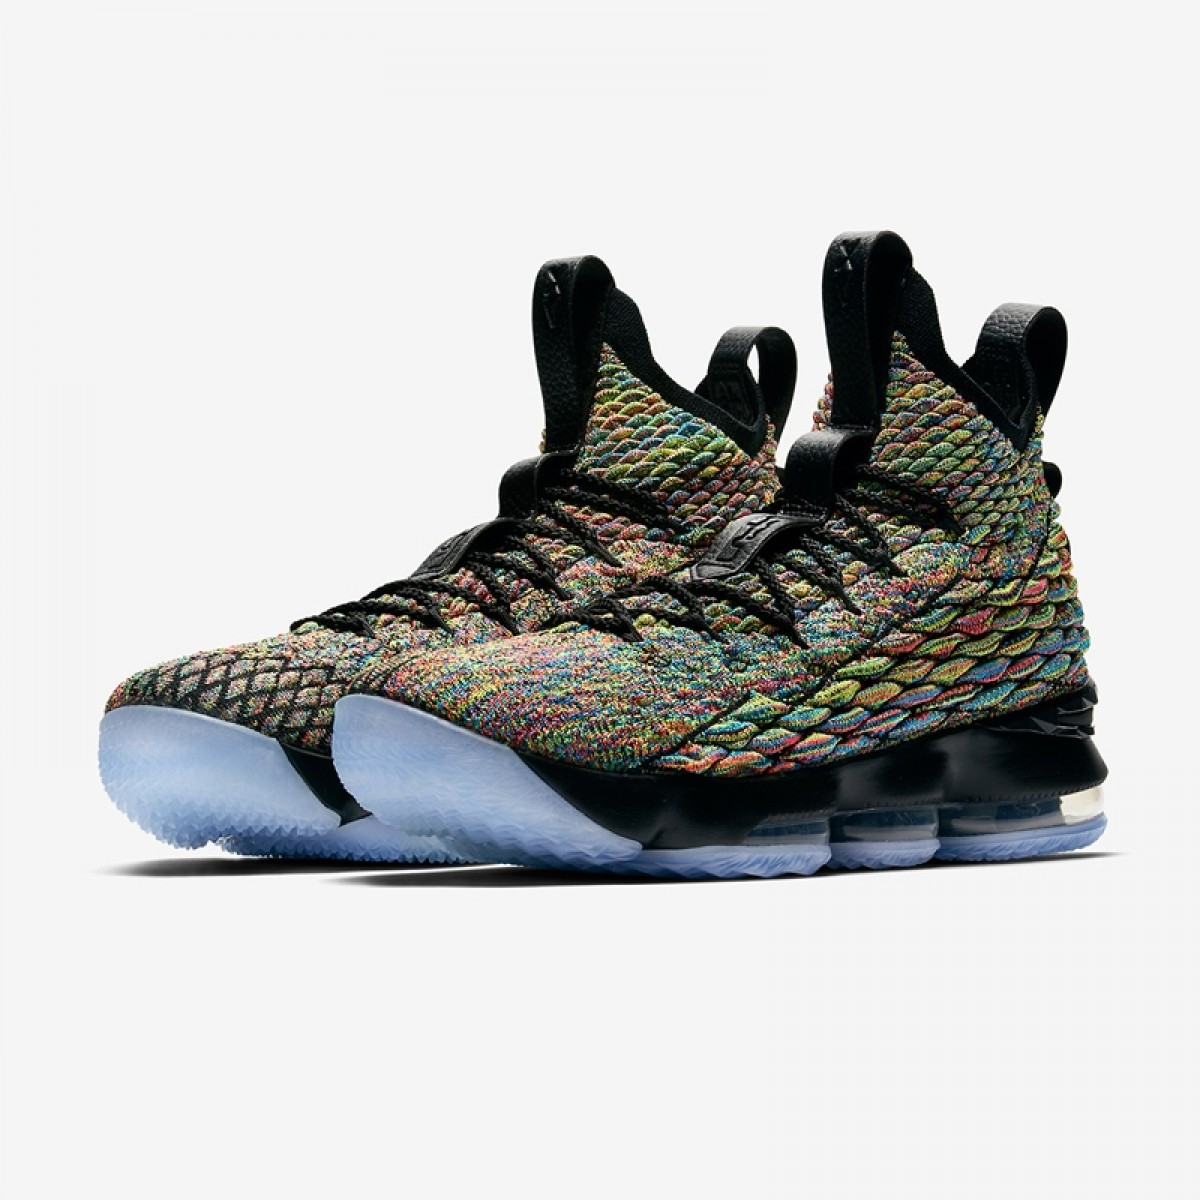 Nike Lebron XV 'Four Horseman' 897648-901